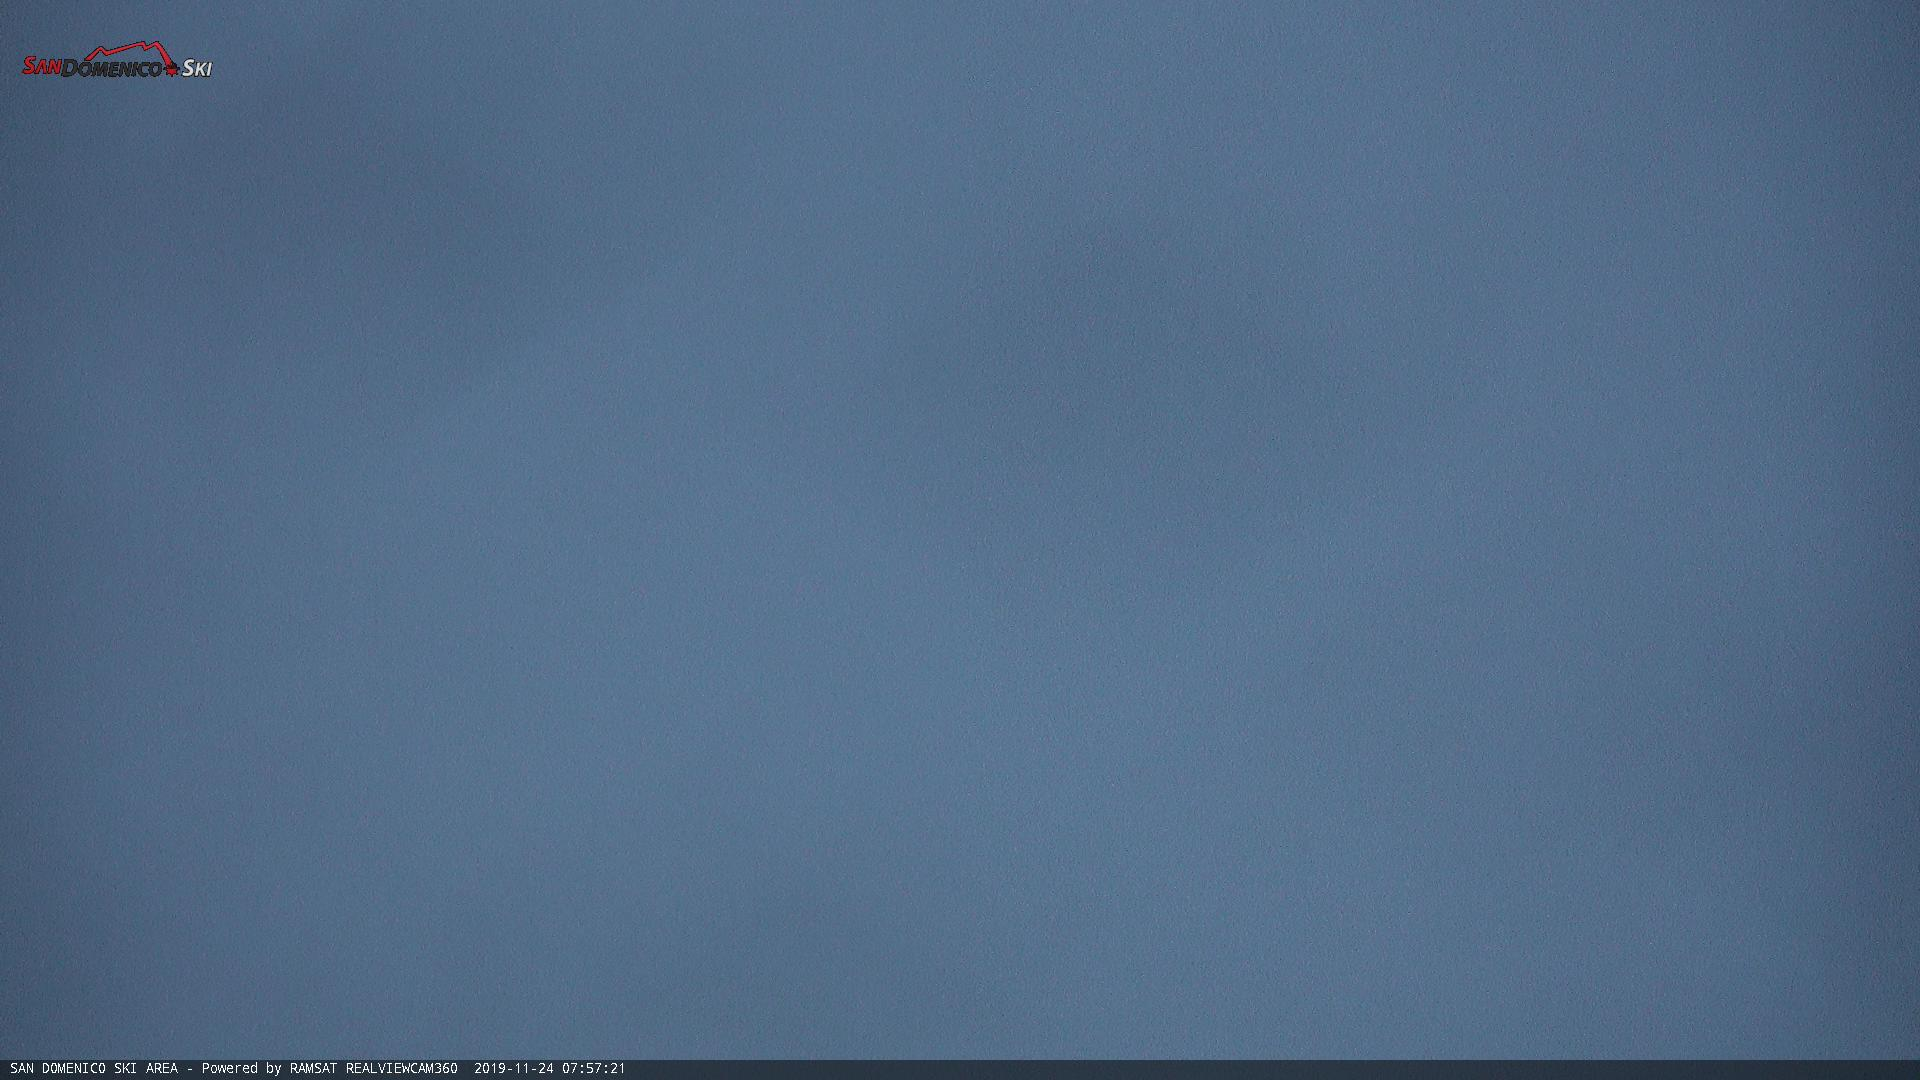 Webcam <br><span>WEBCAM SAN DOMENICO</span>